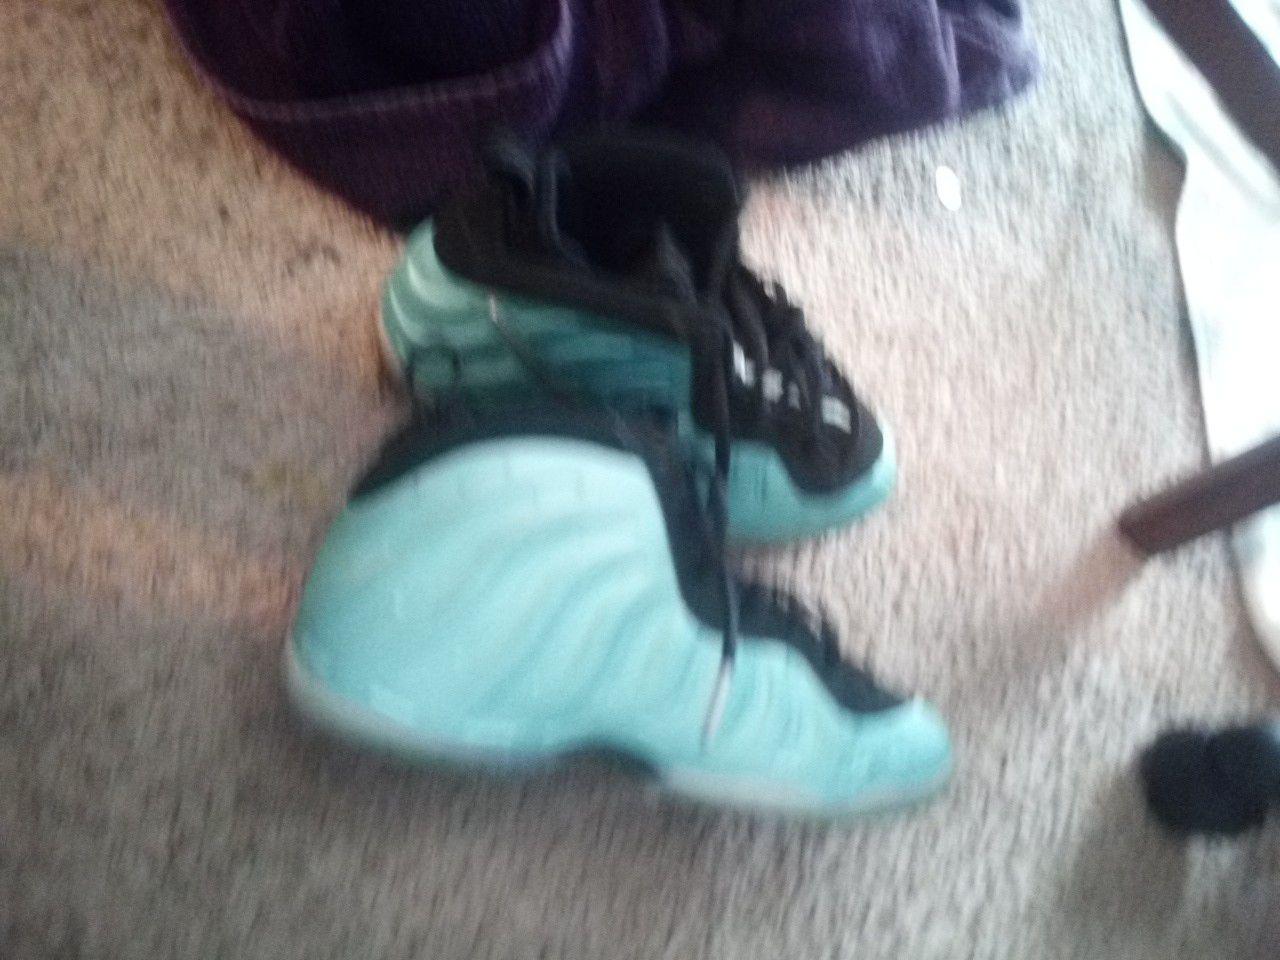 Nike phomes size 3